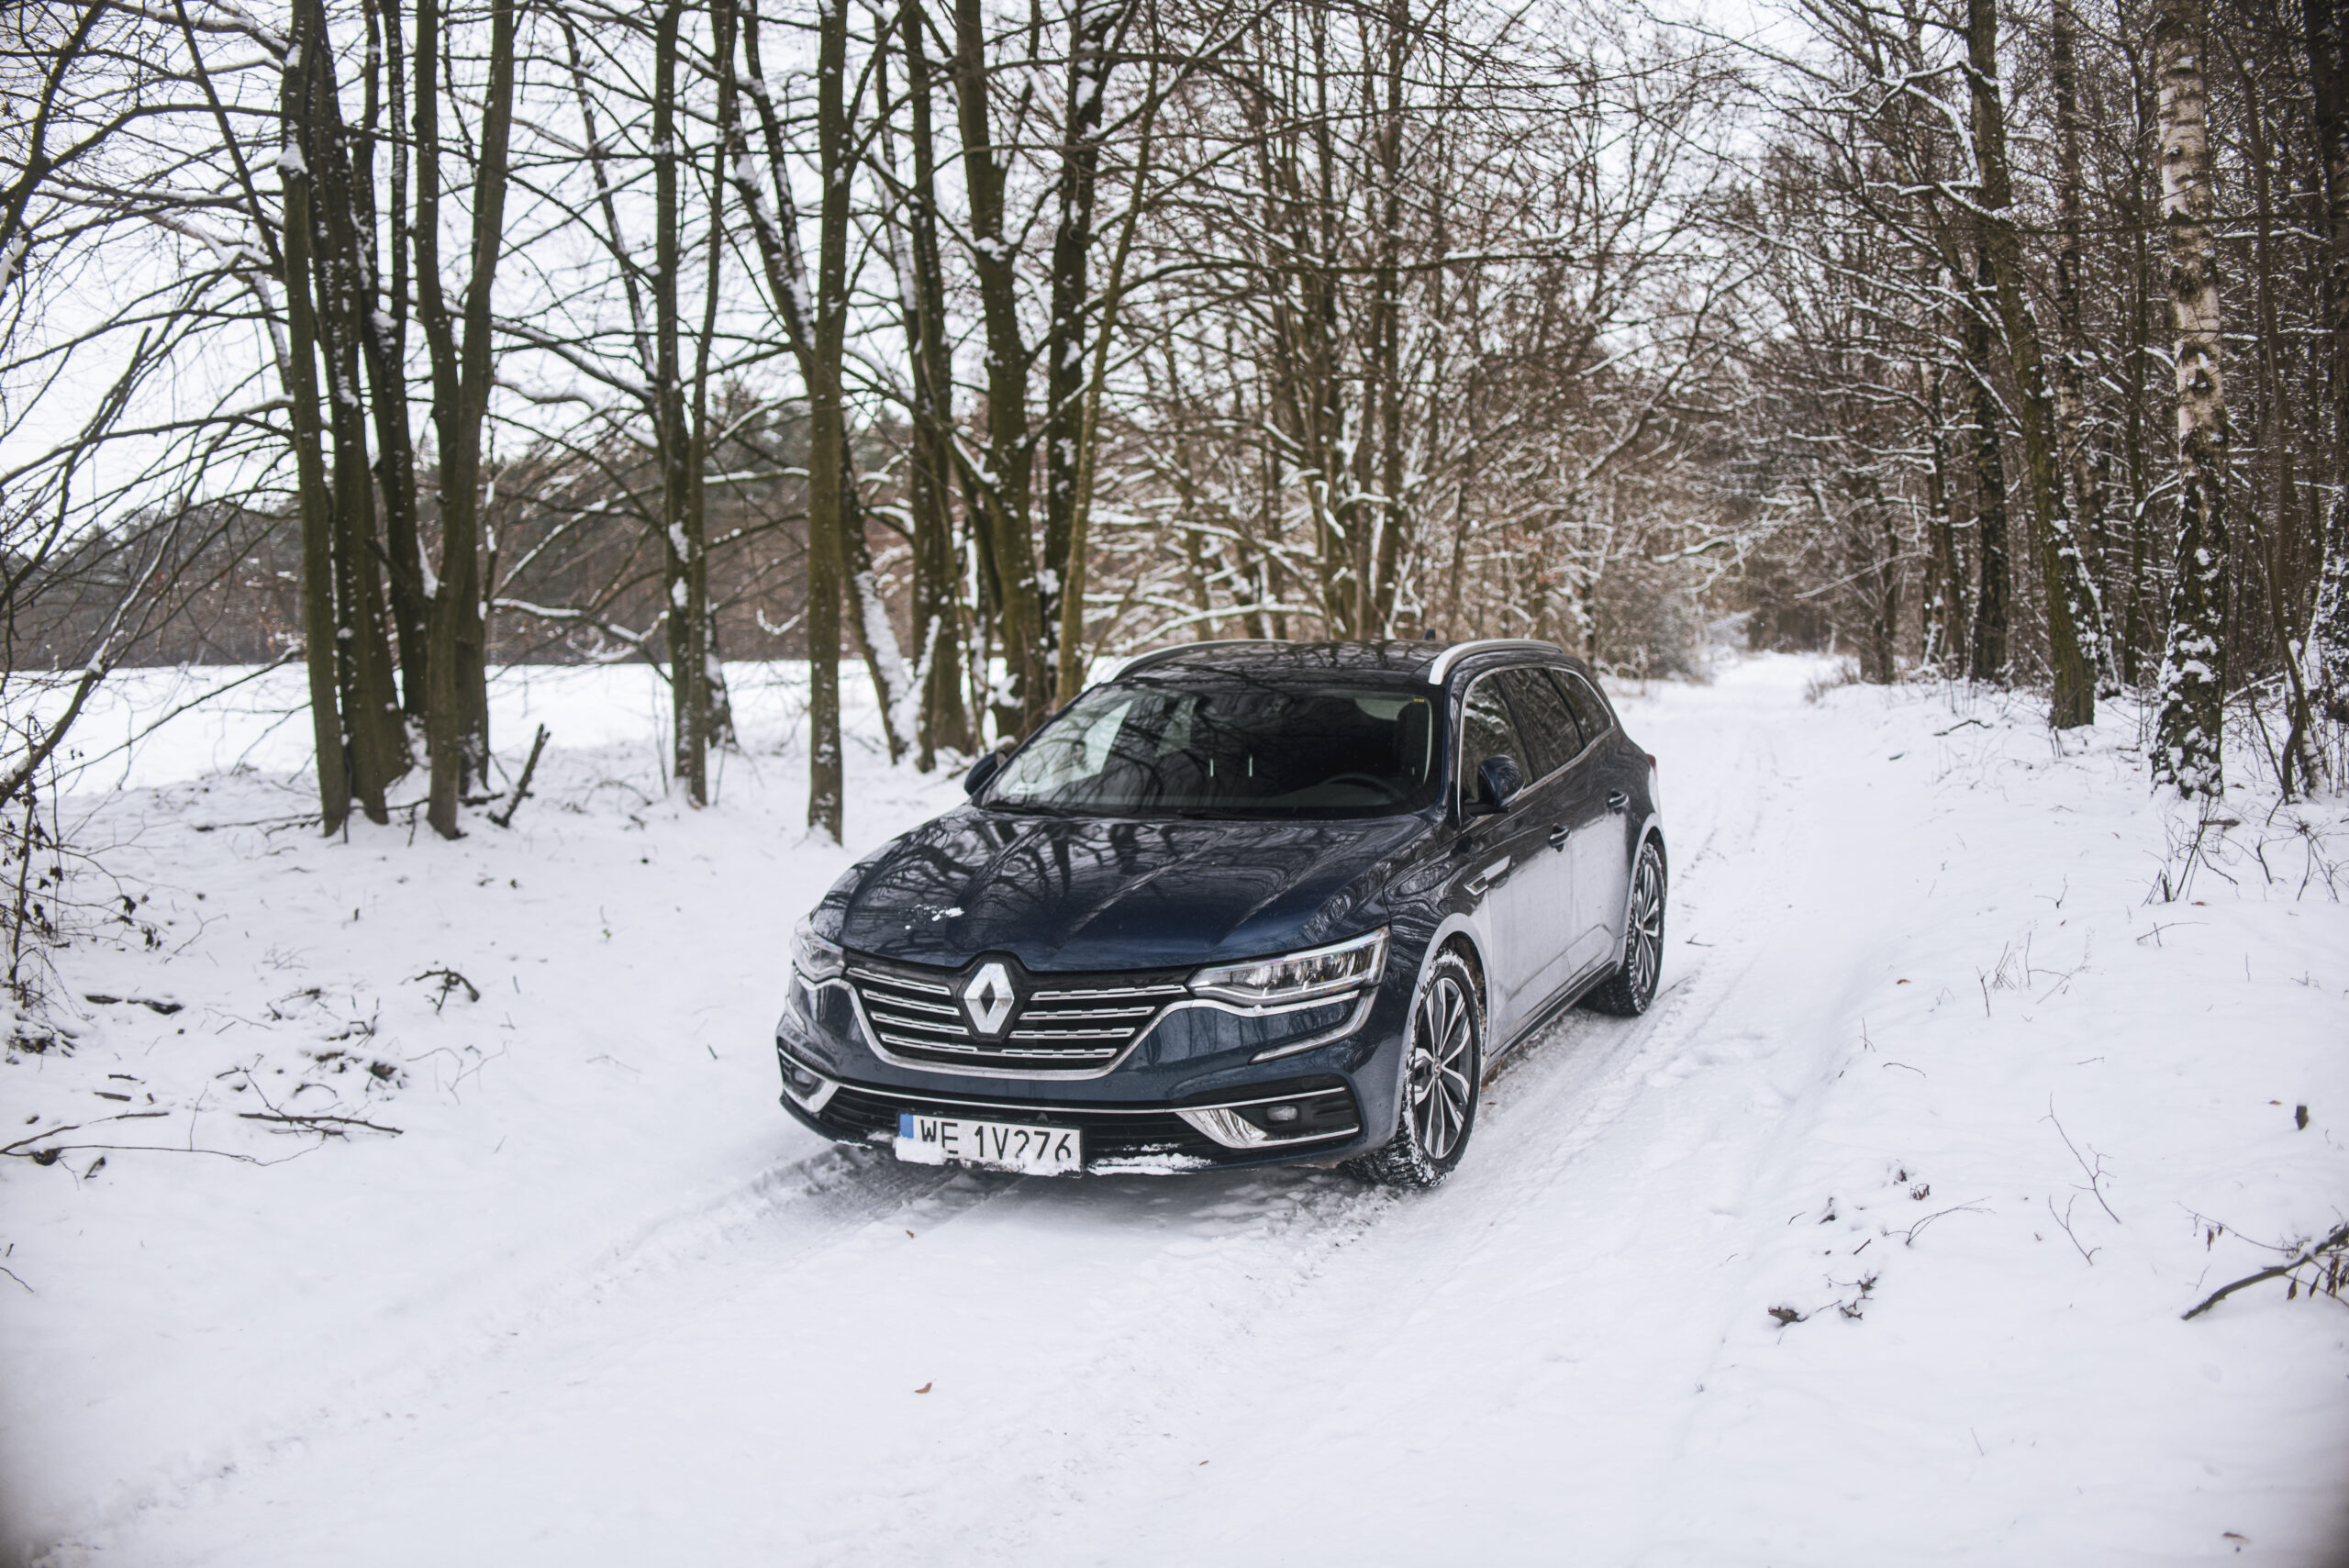 Renault Talisman Grandtour Intens 1.3 TCE